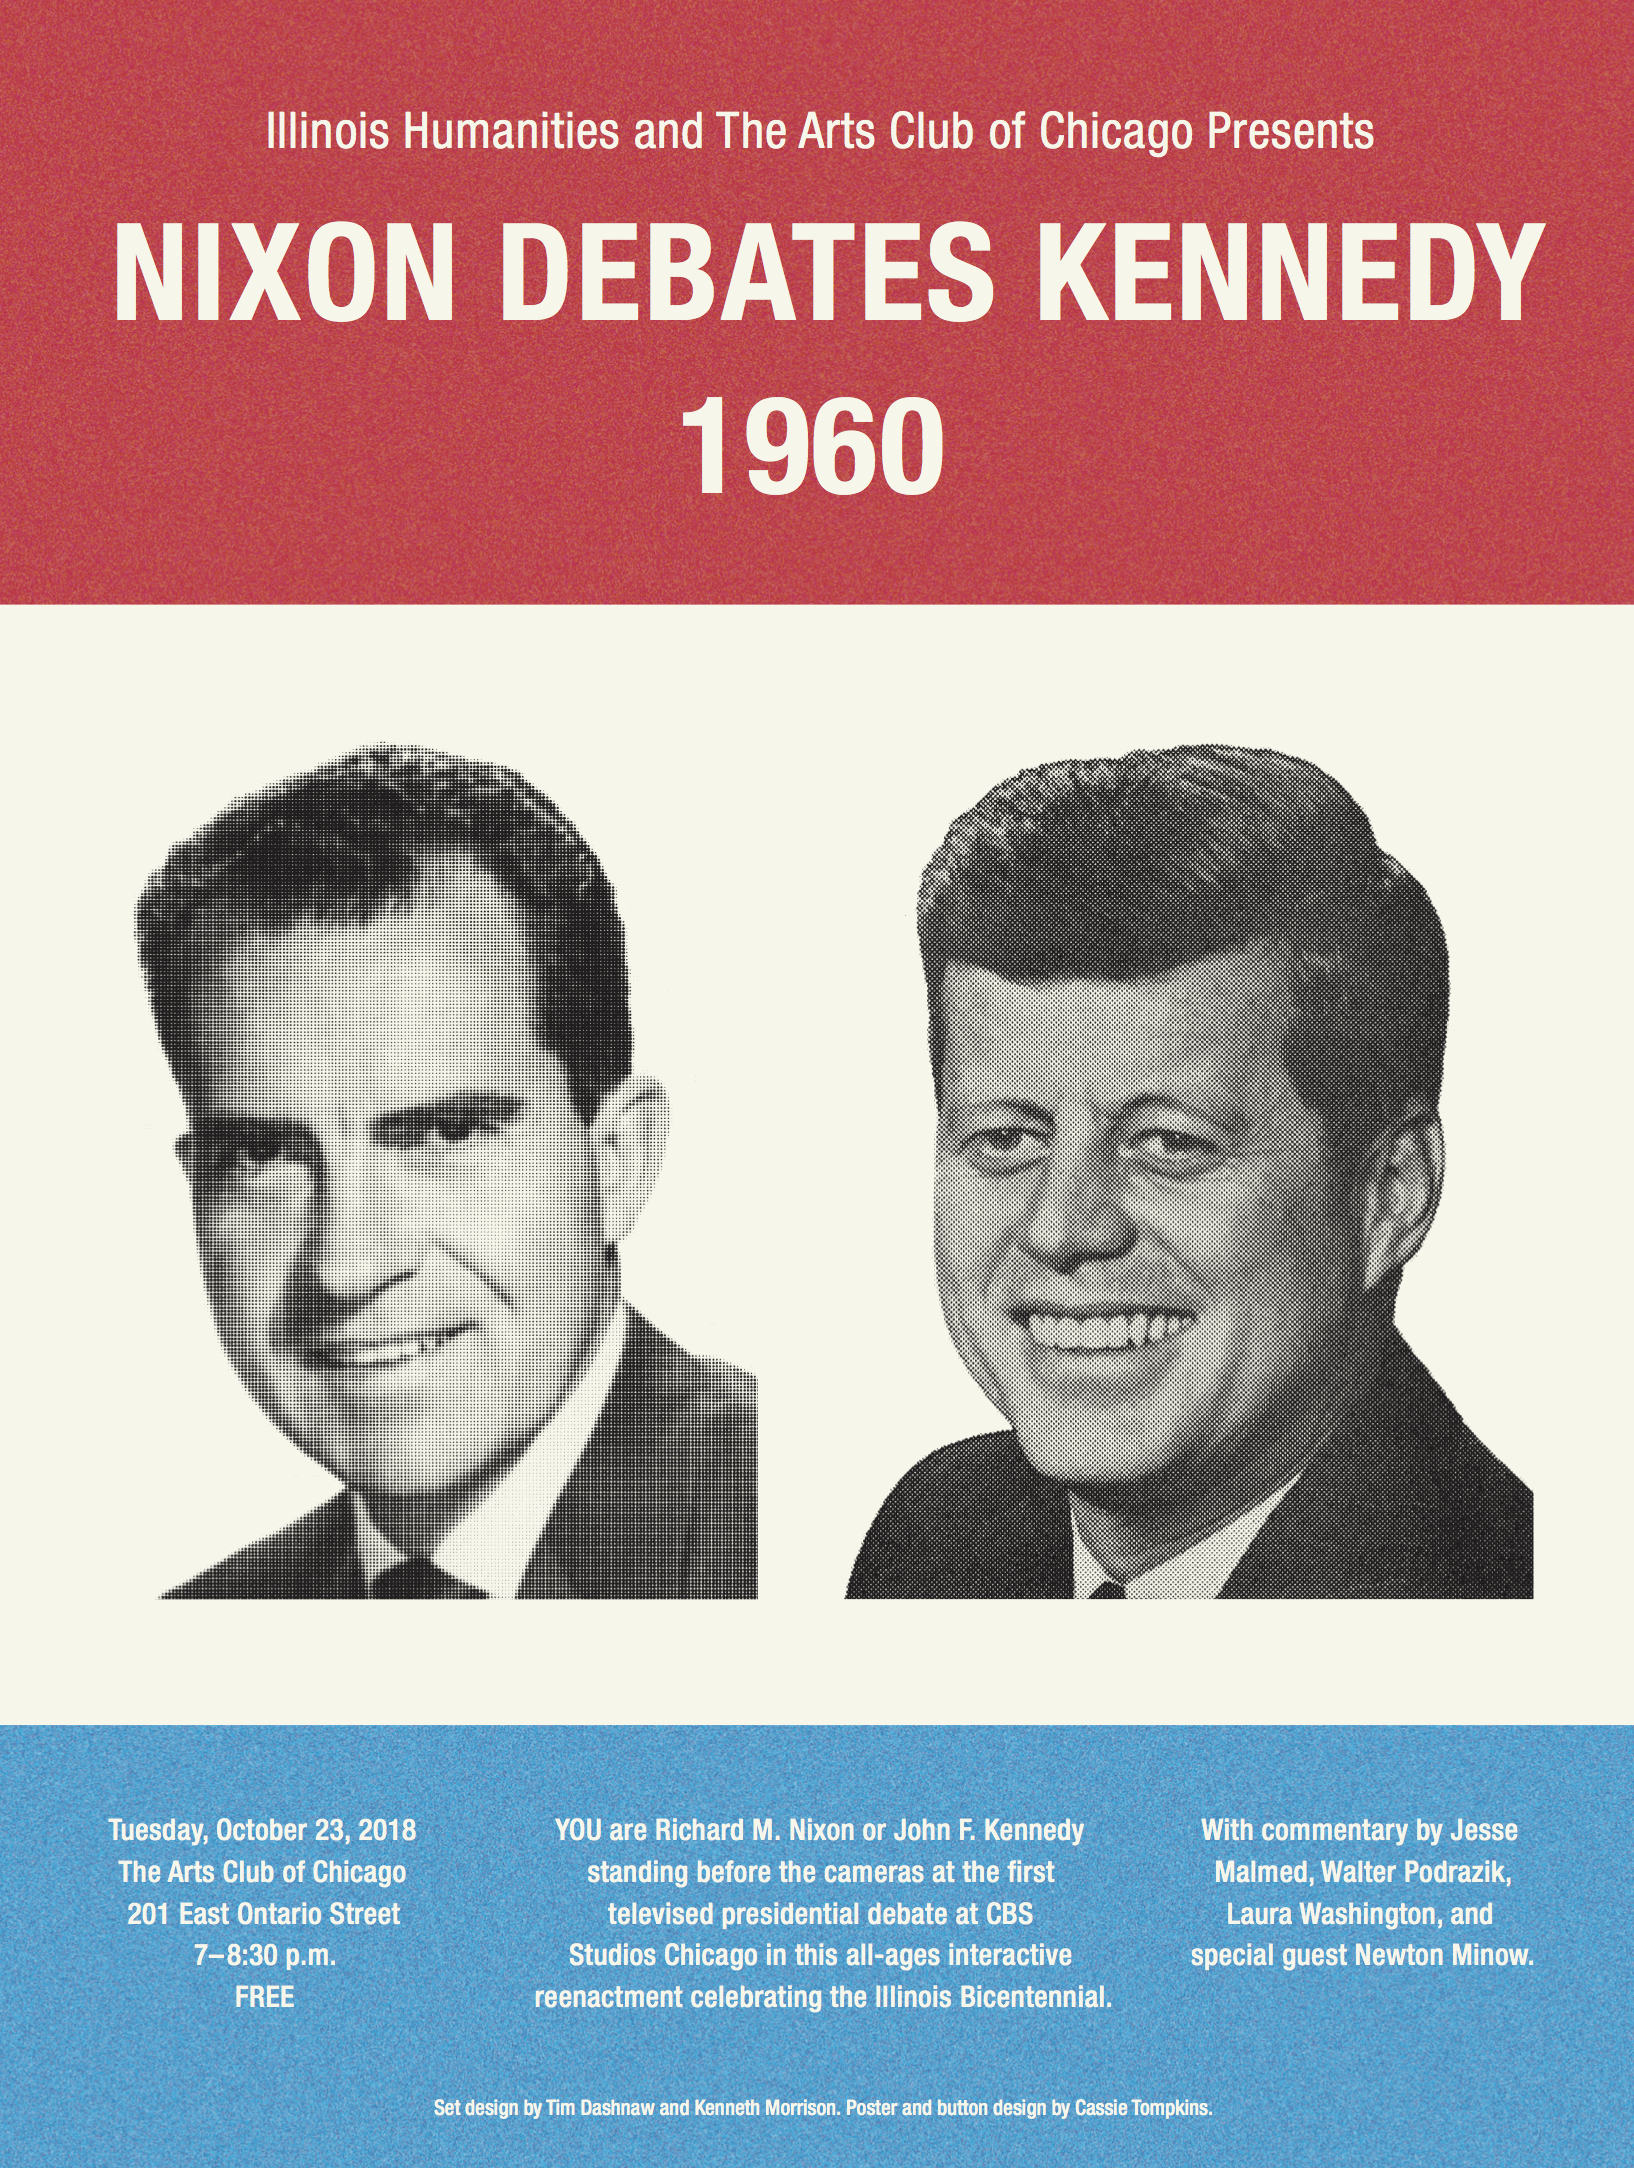 Nixon Debates Kennedy Poster